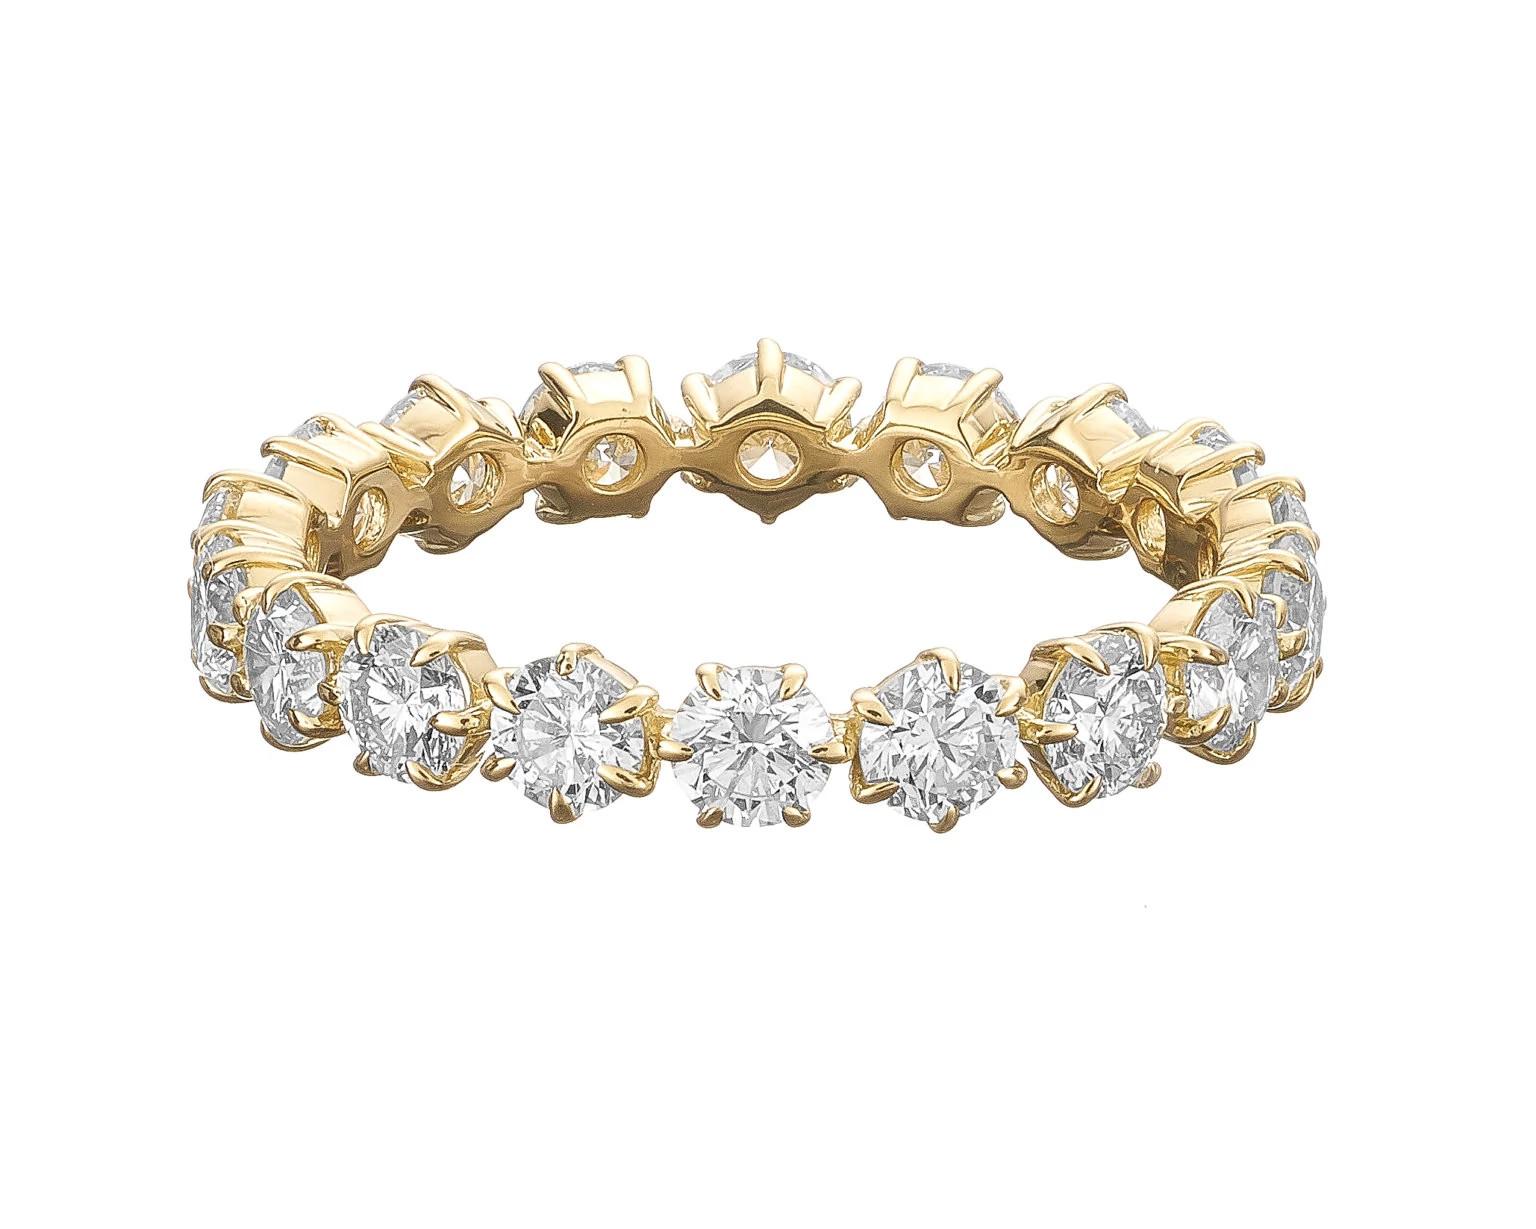 Jade Trau Catherine Eternity No. 3 天然钻石戒指黄金款